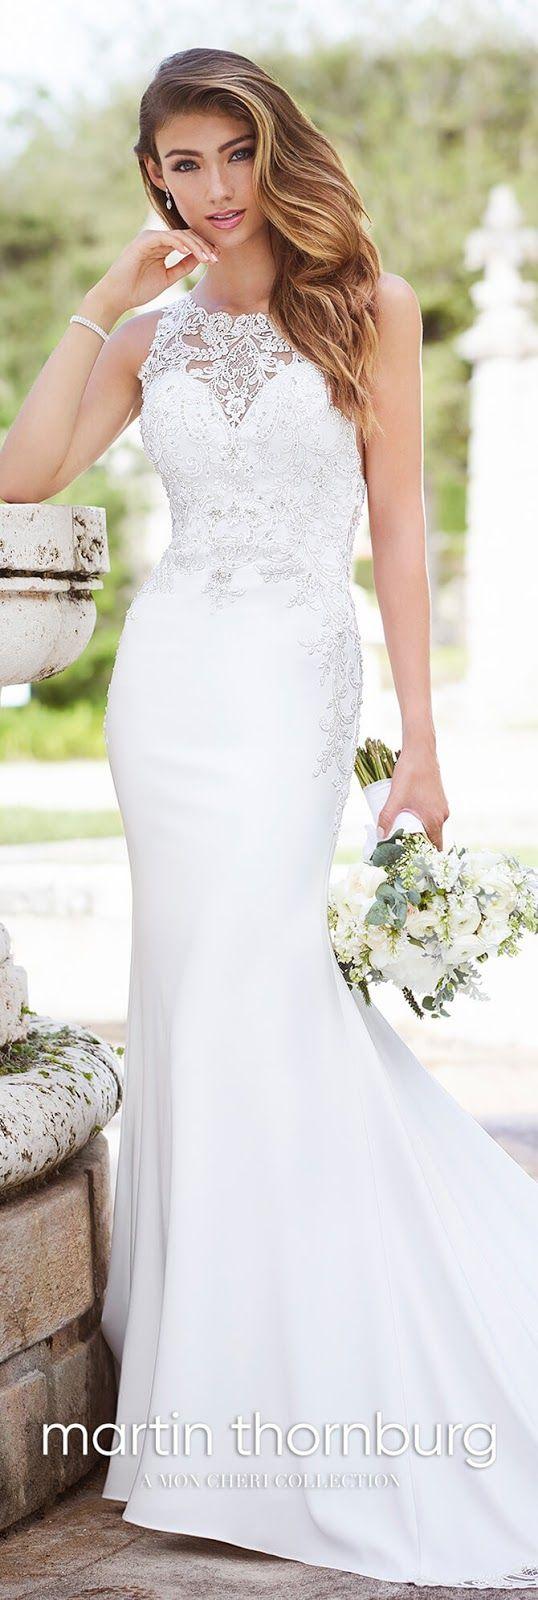 Martin thornburg fall bridal collection mon cheri wedding